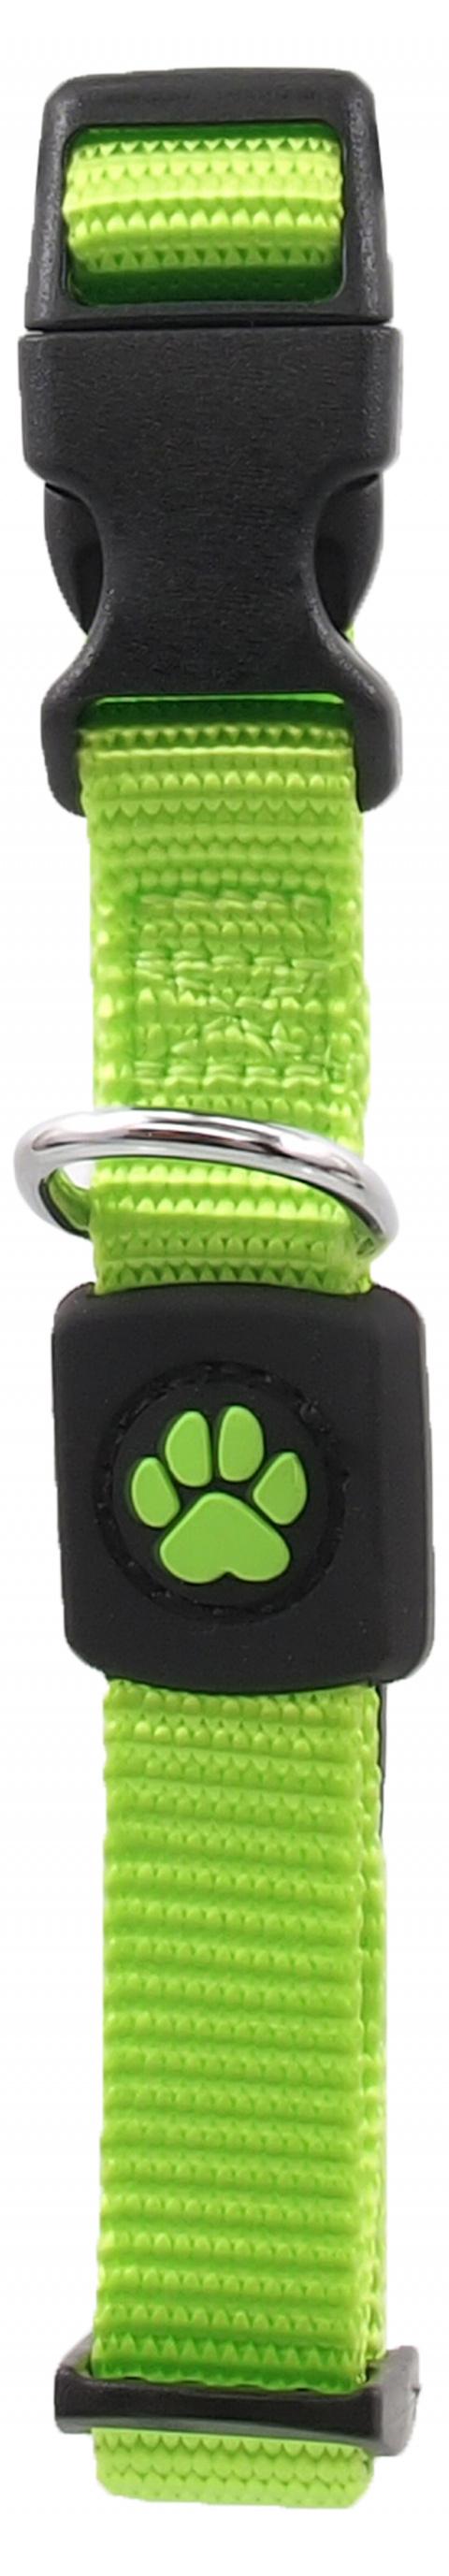 Obojek Active Dog Premium S limetka 1,5x27-37cm title=